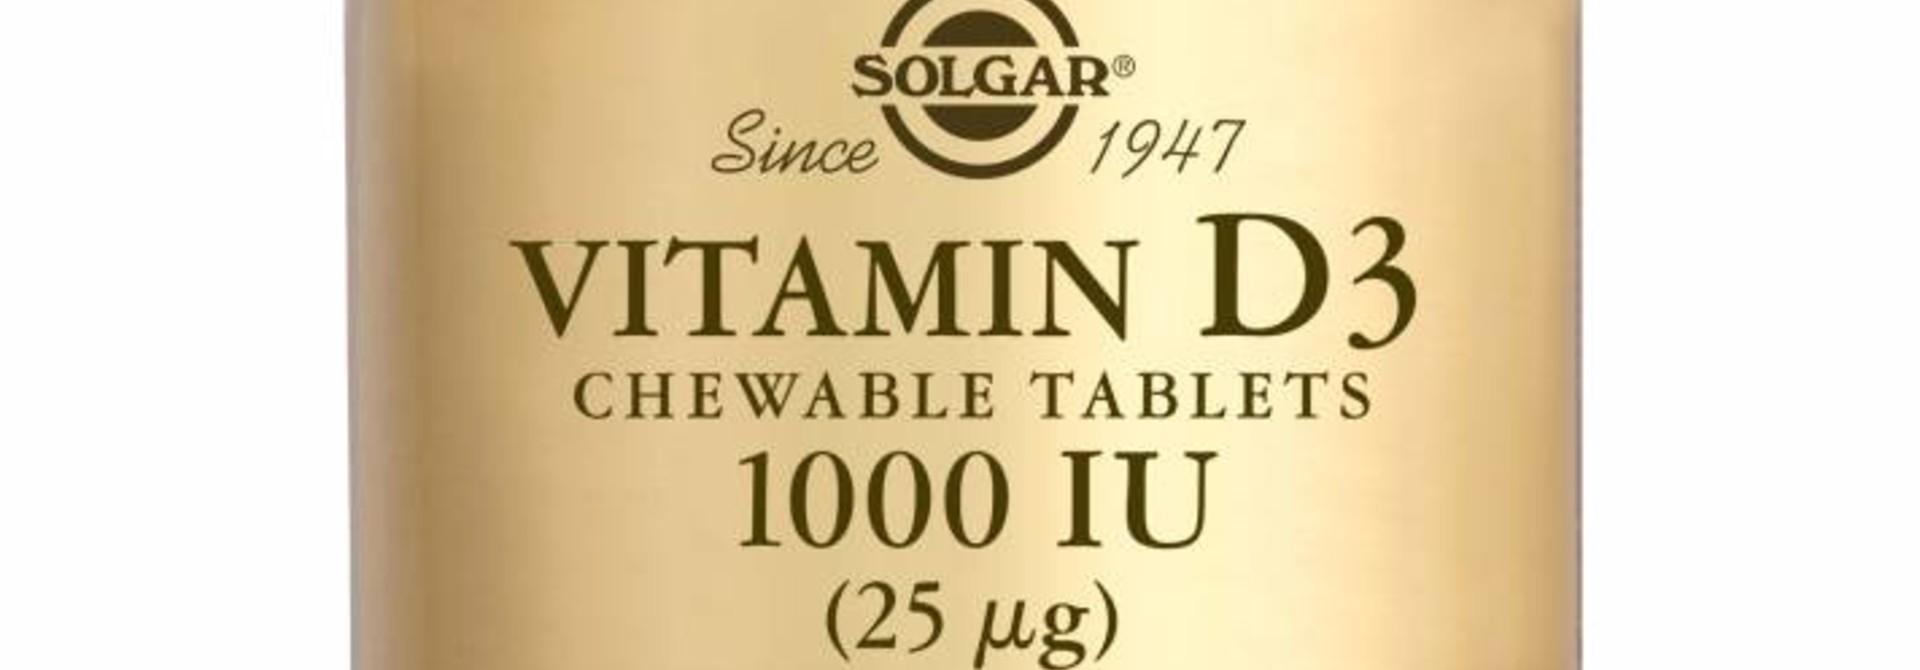 Vitamin D-3 1000 IU/25 µg Chewable Tablets 100 kauwtabletten